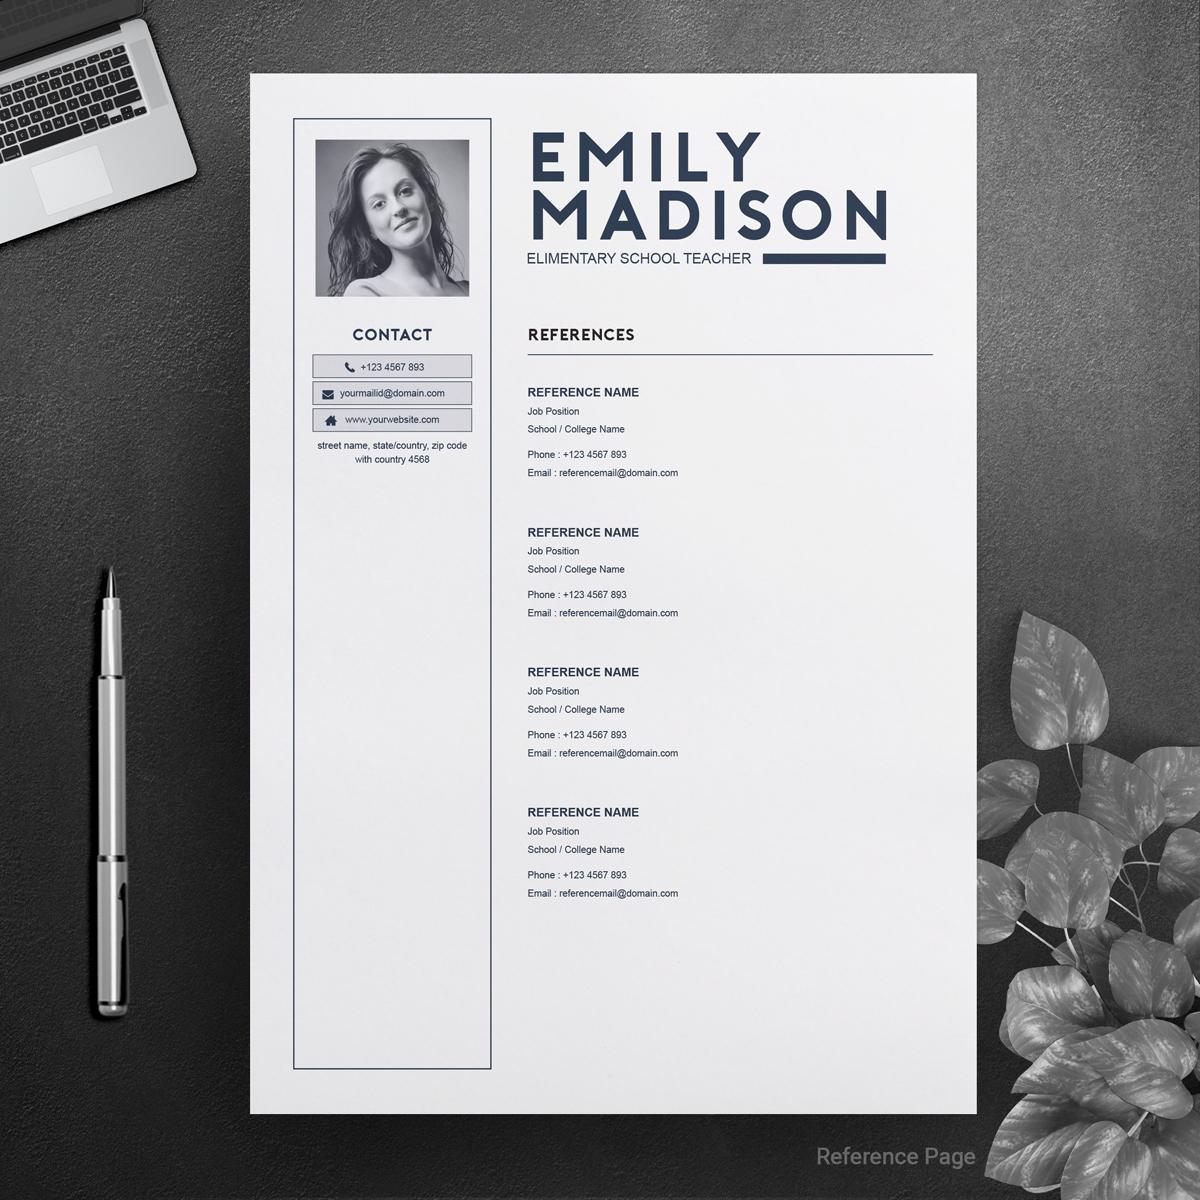 emily madison resume template  74367